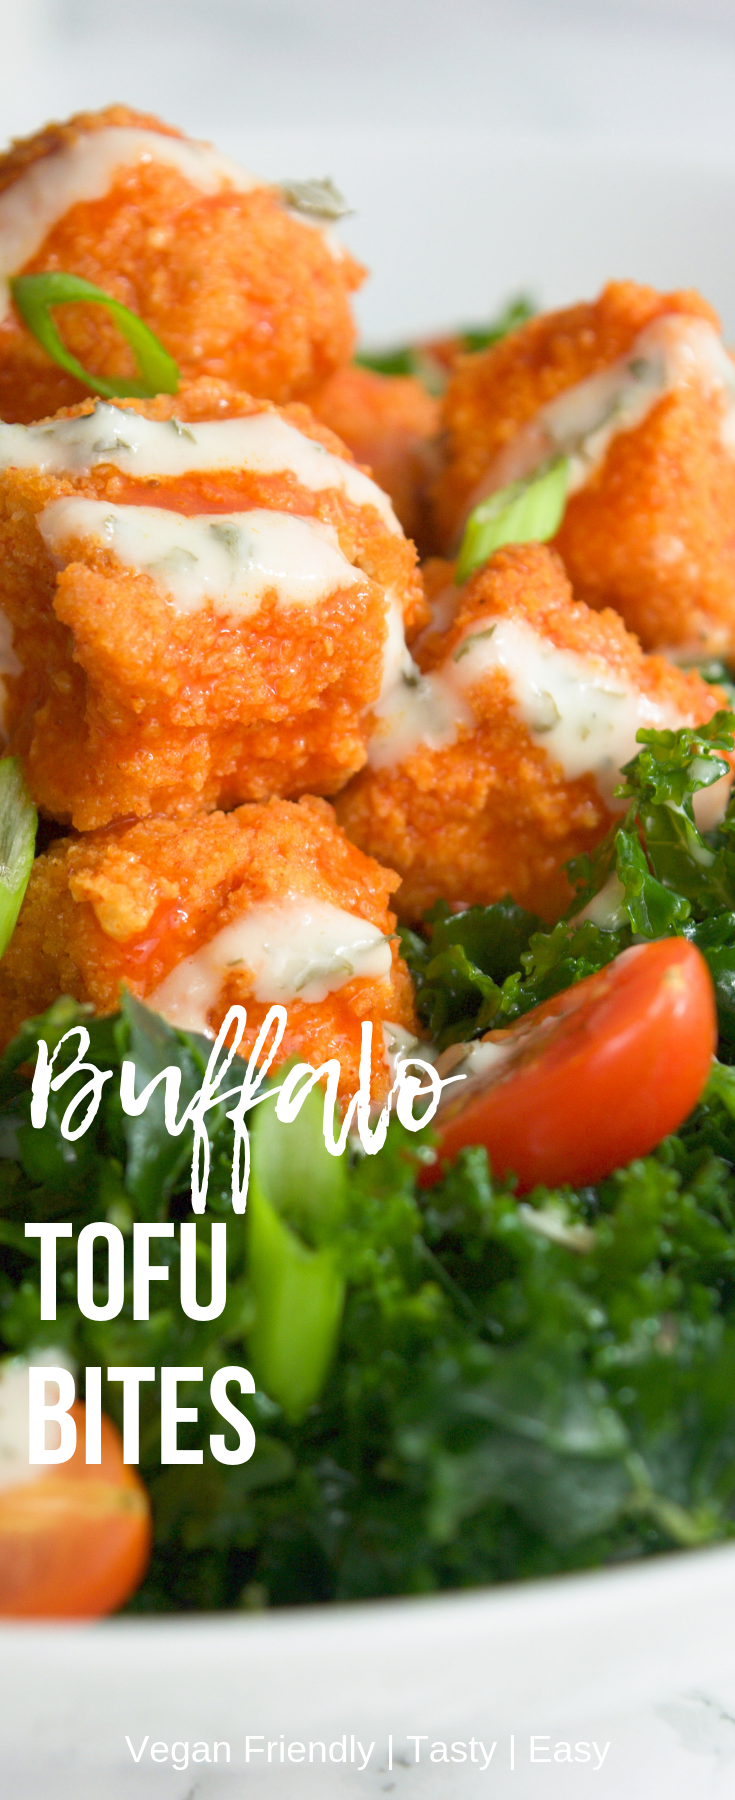 , Buffalo Tofu Bites   ICanYouCanVegan I Can You Can Vegan Baked Buffalo Tofu Bites, Travel Couple, Travel Couple